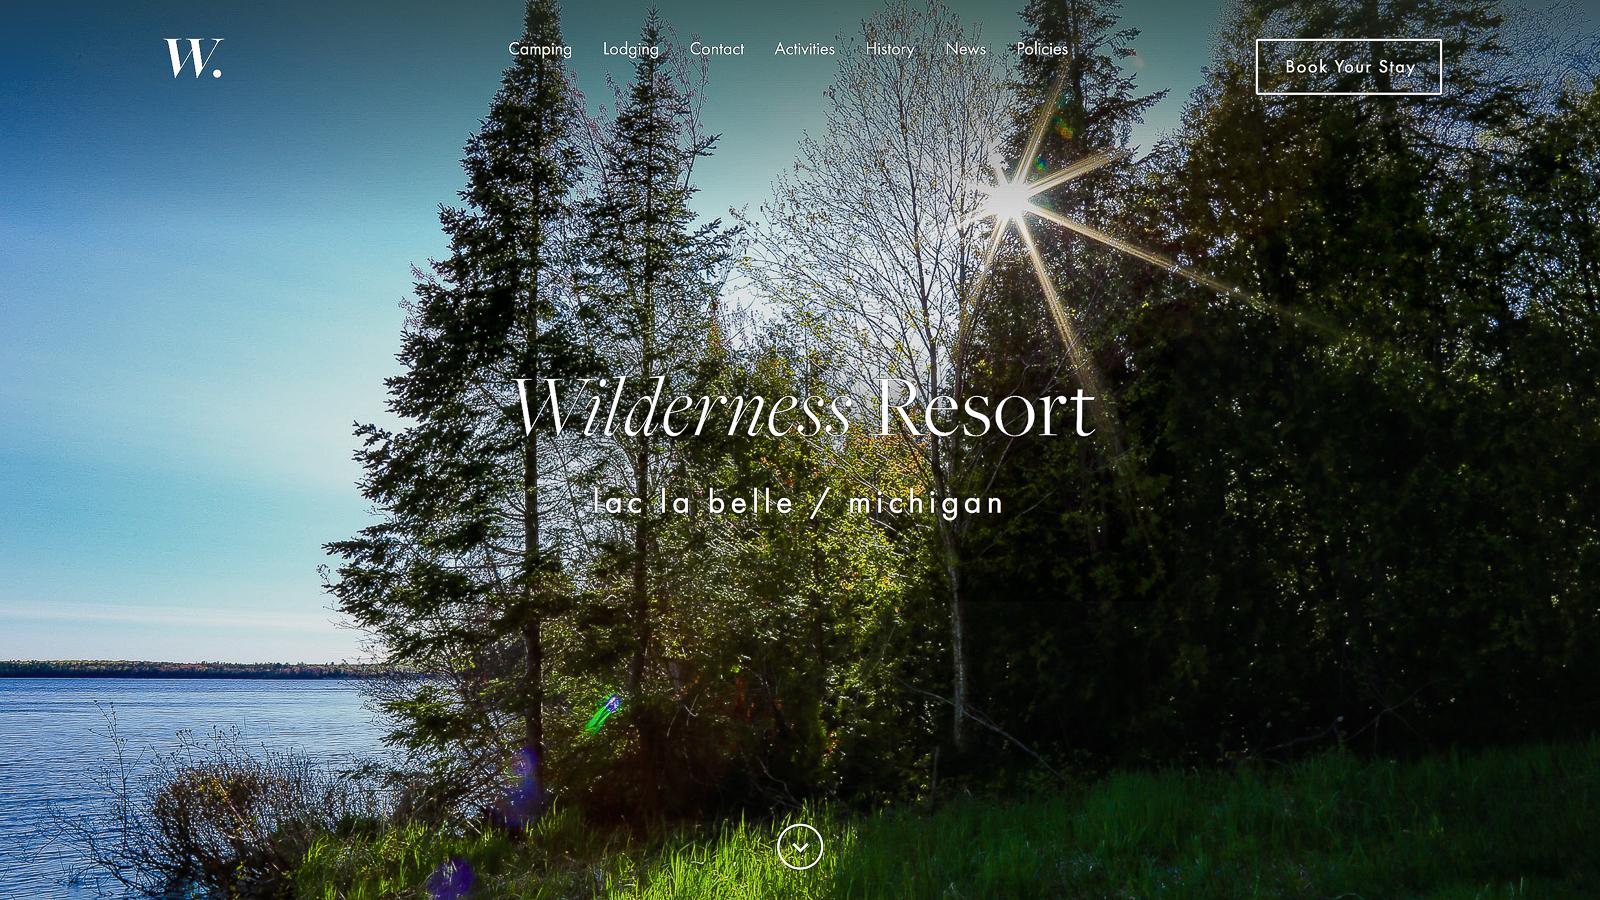 New Wilderness Resort Website Homepage